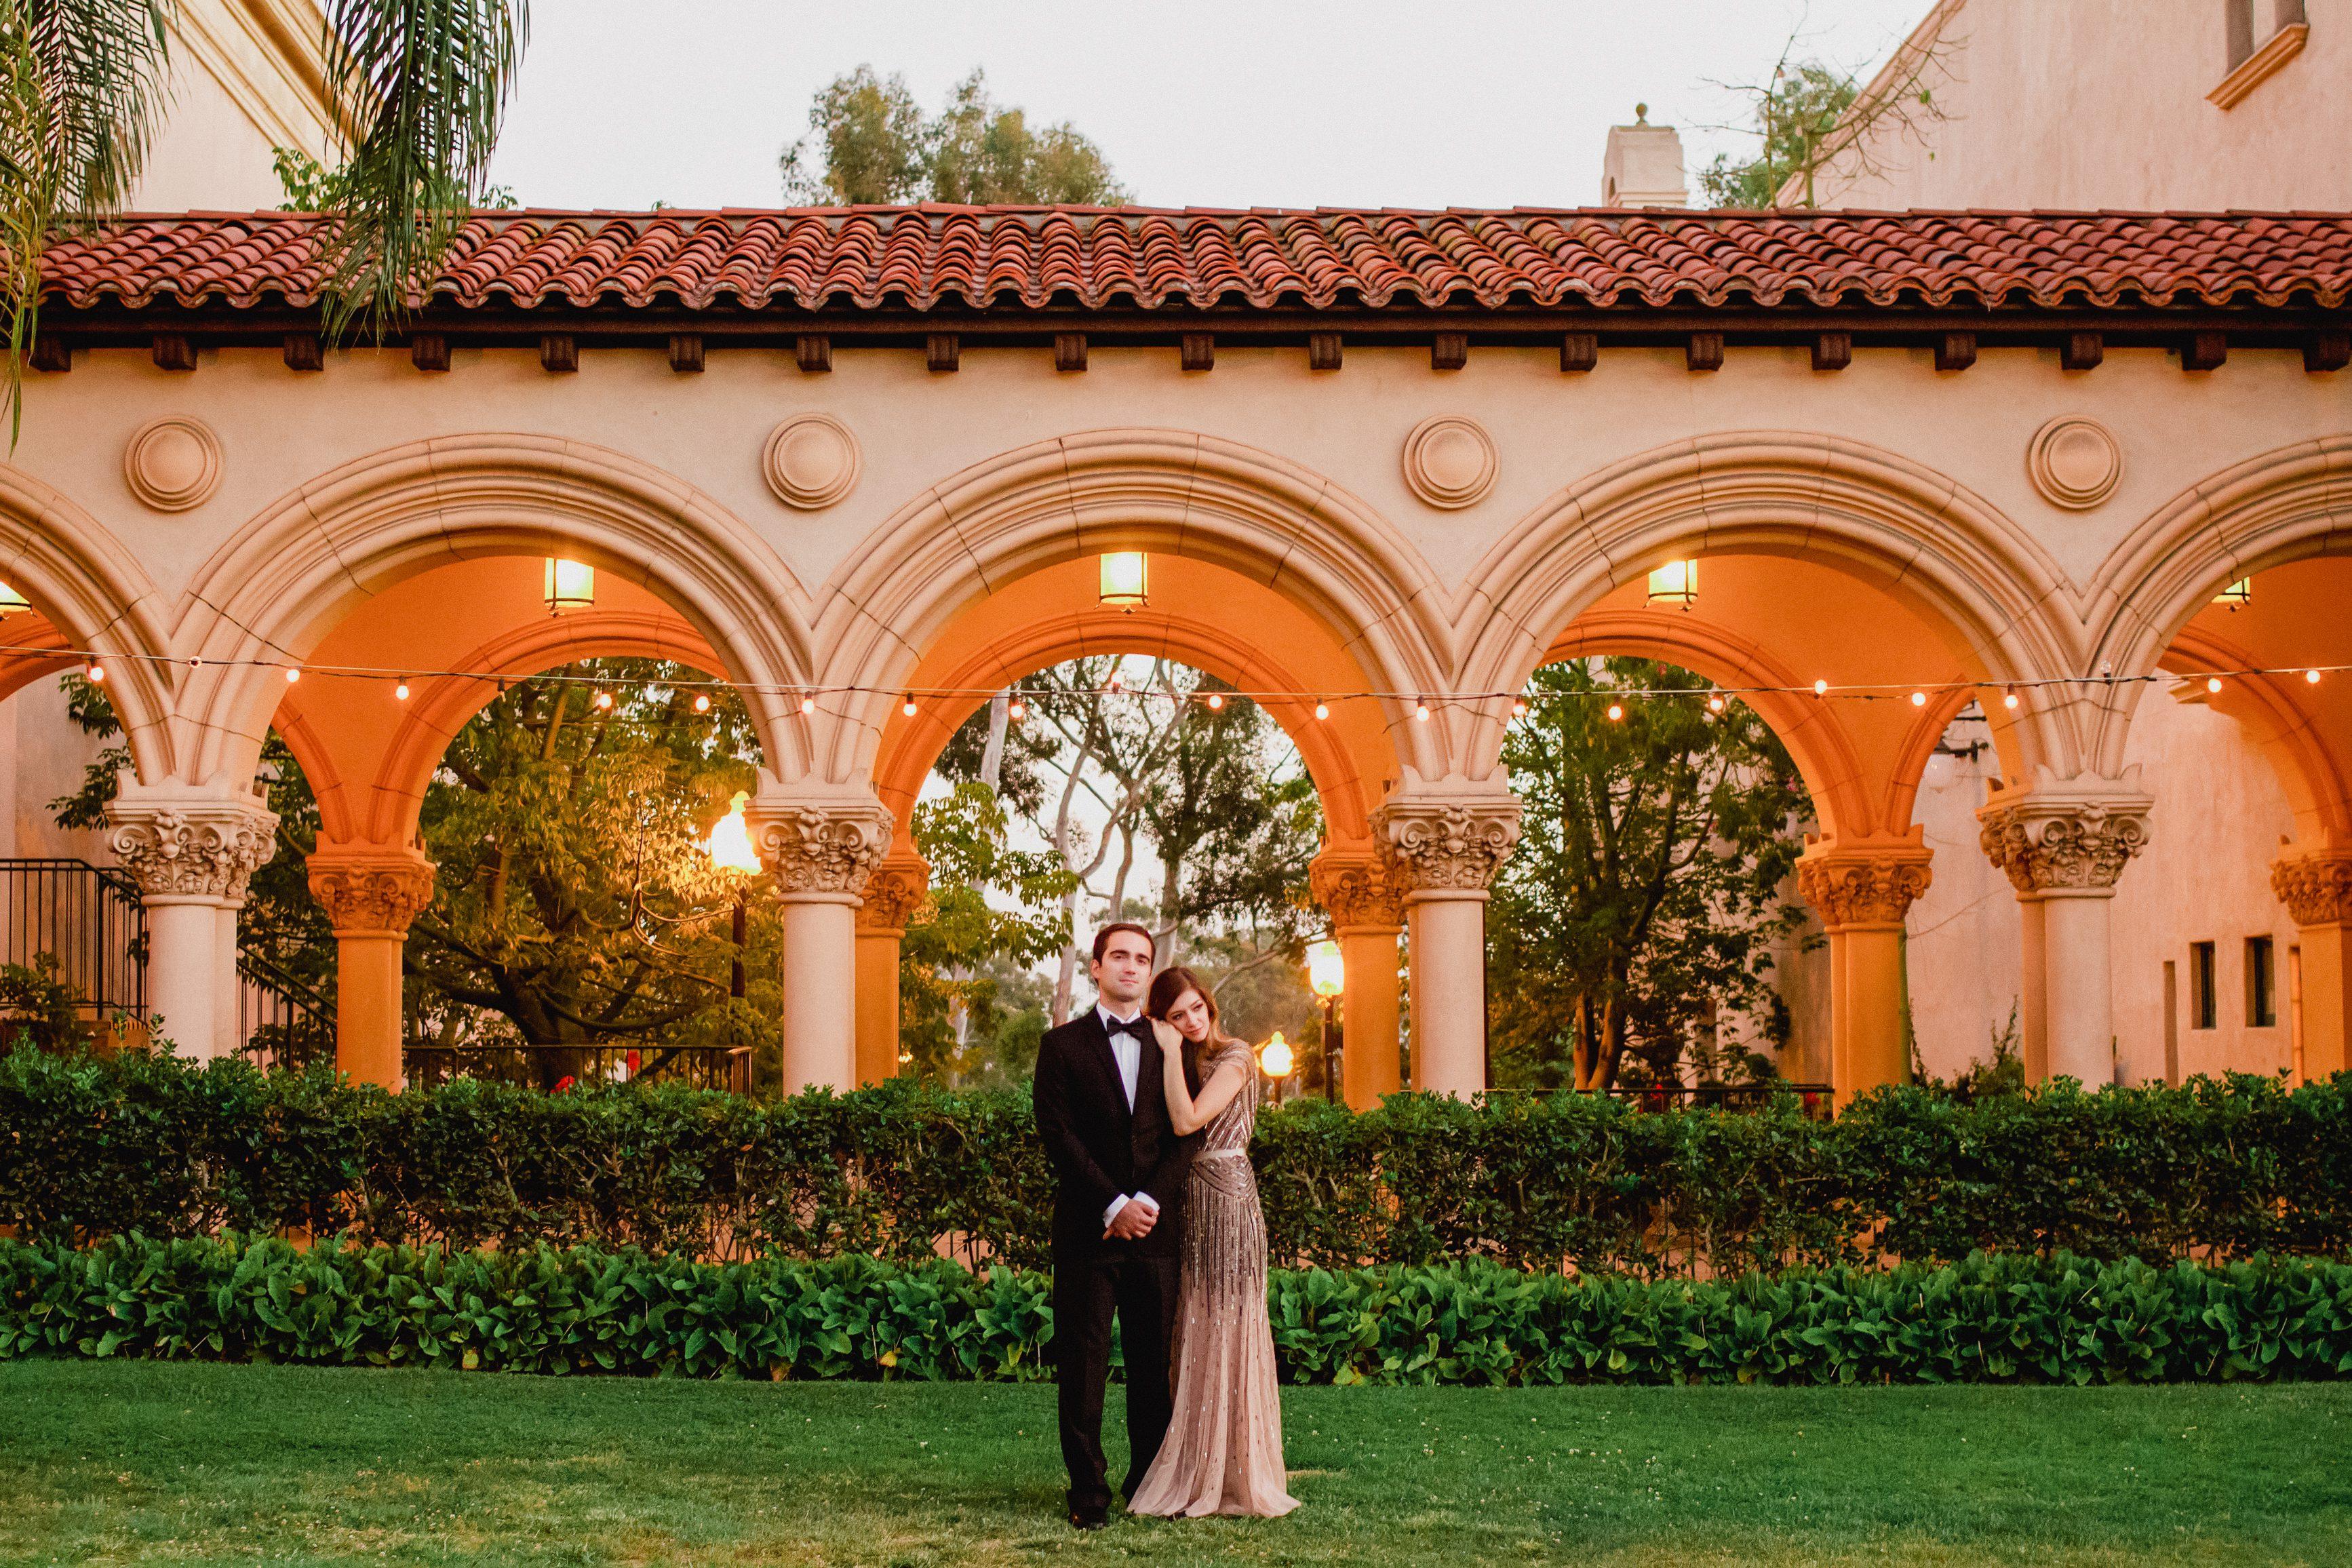 Balboa park wedding photos The Prado at Balboa Park Restaurant - San Diego, CA